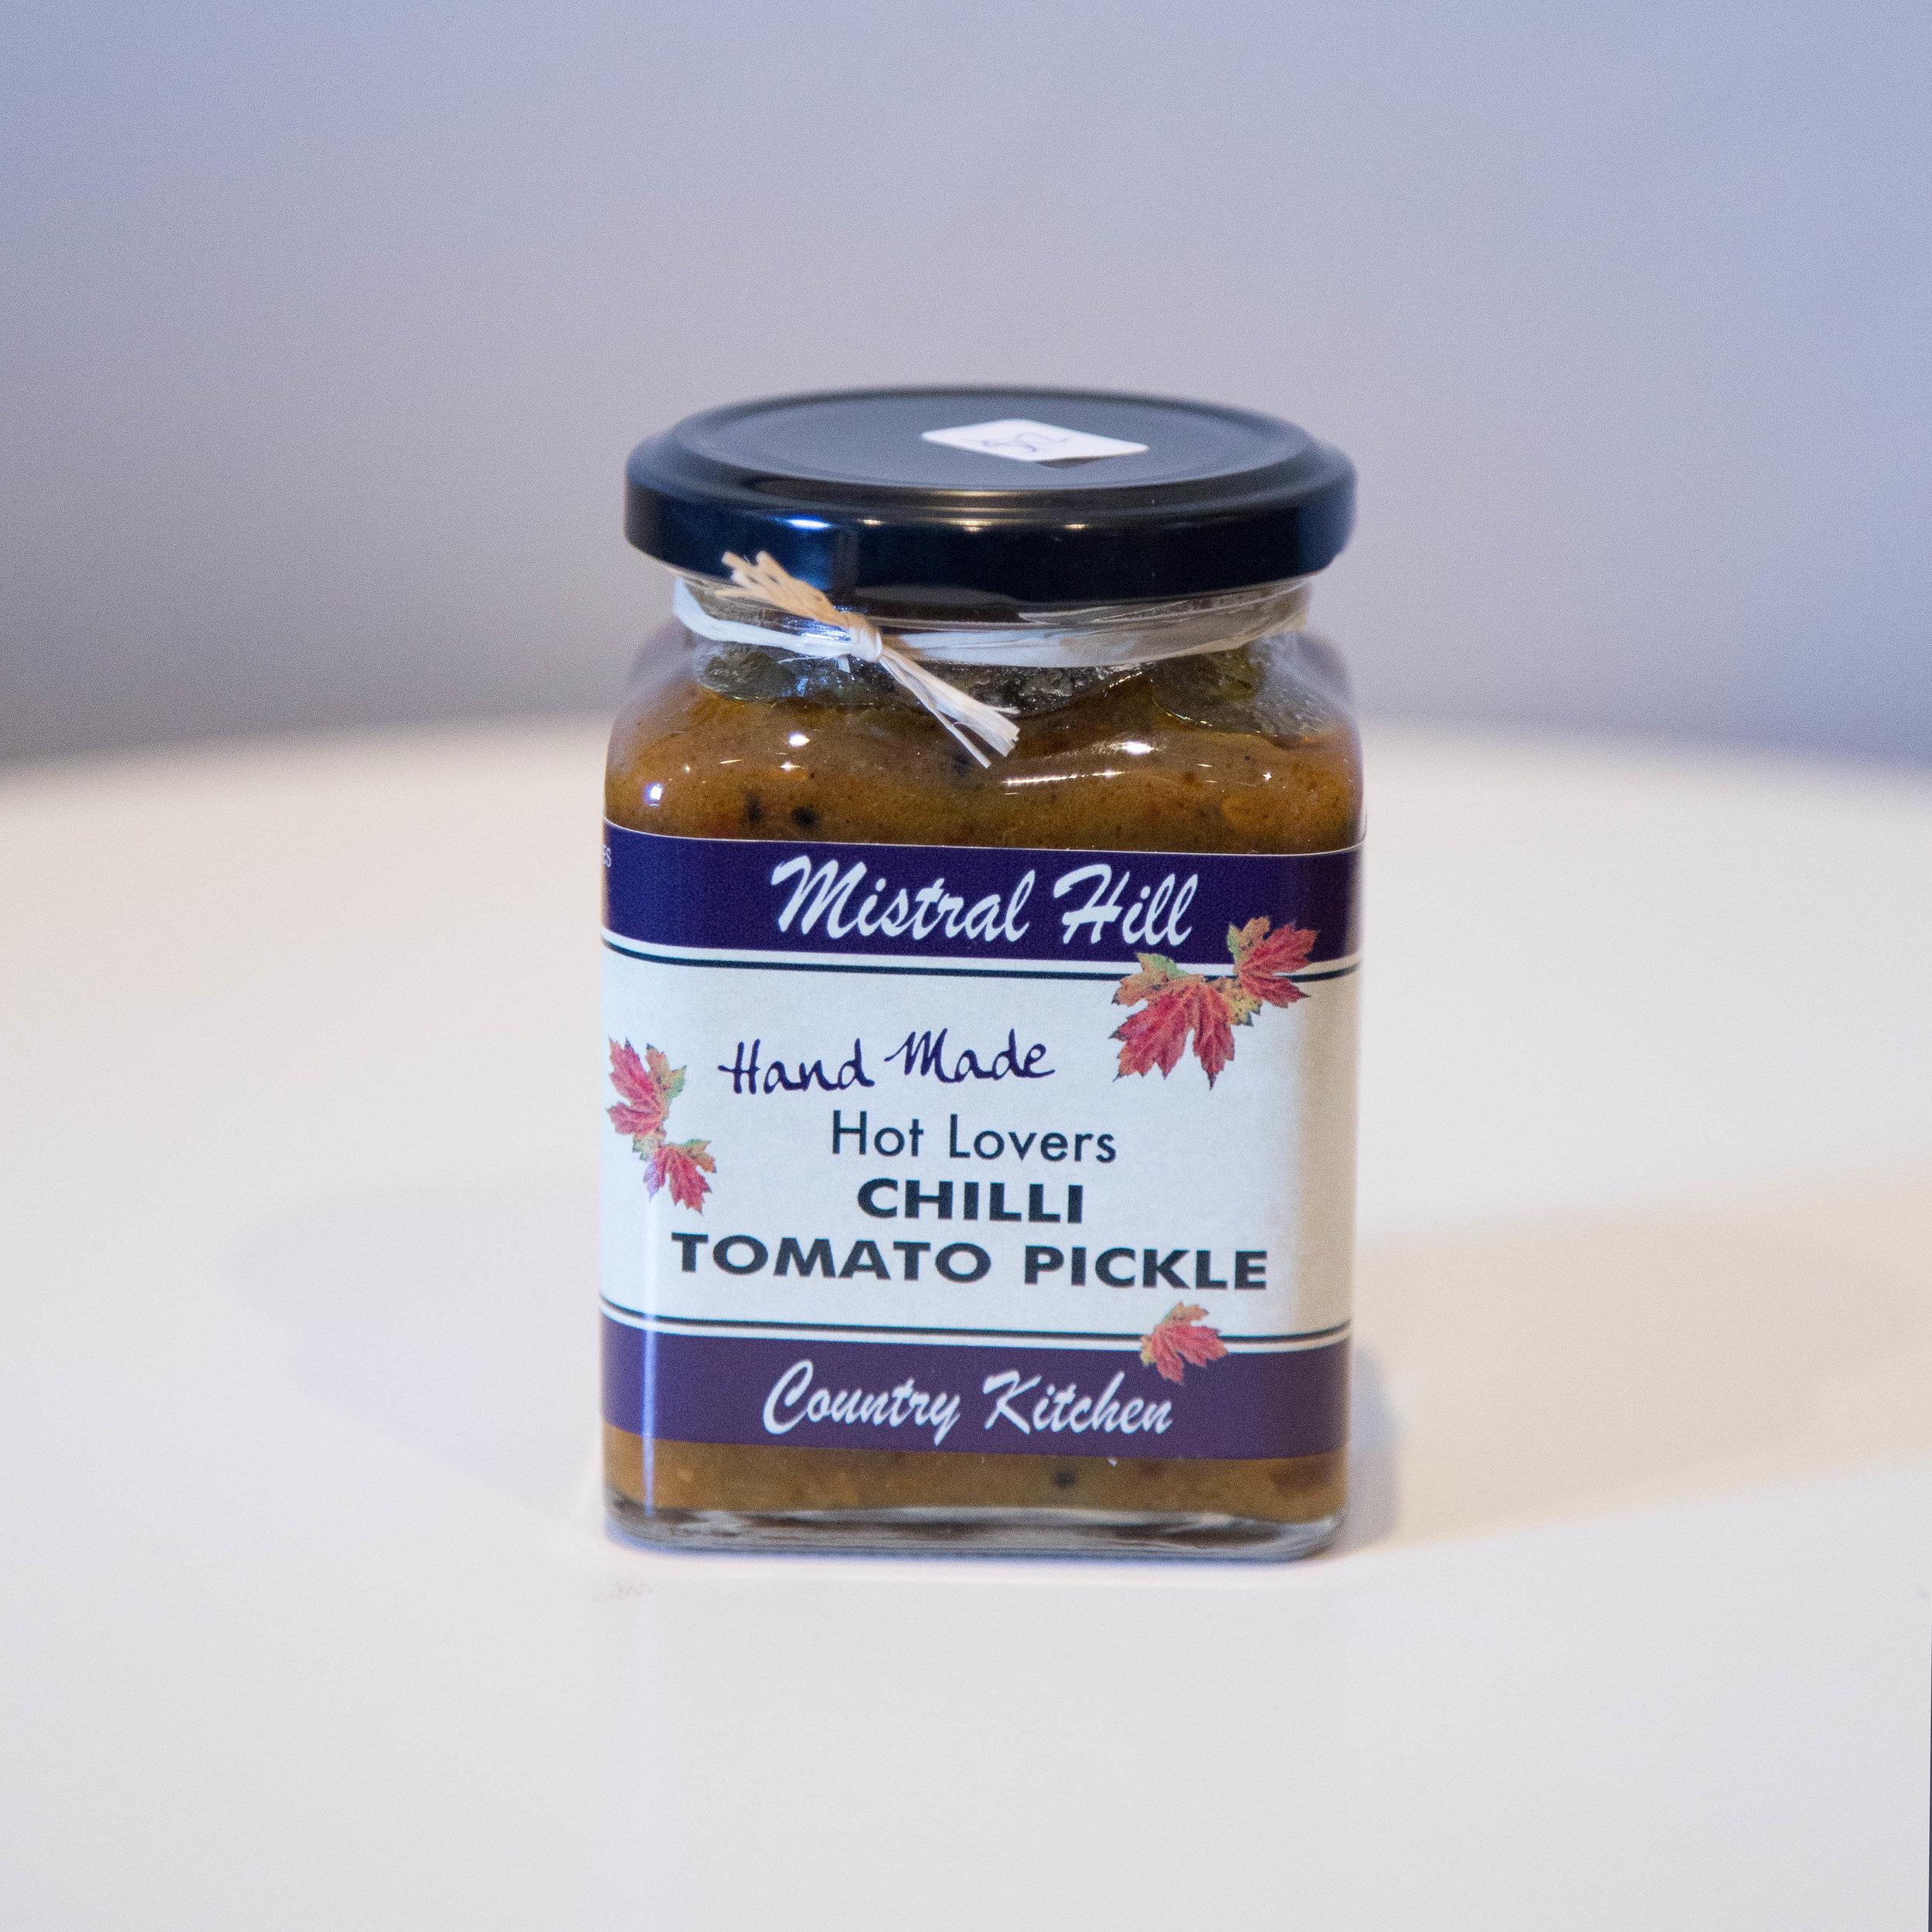 Mistral Hill - Chilli Tomato Pickles - $12